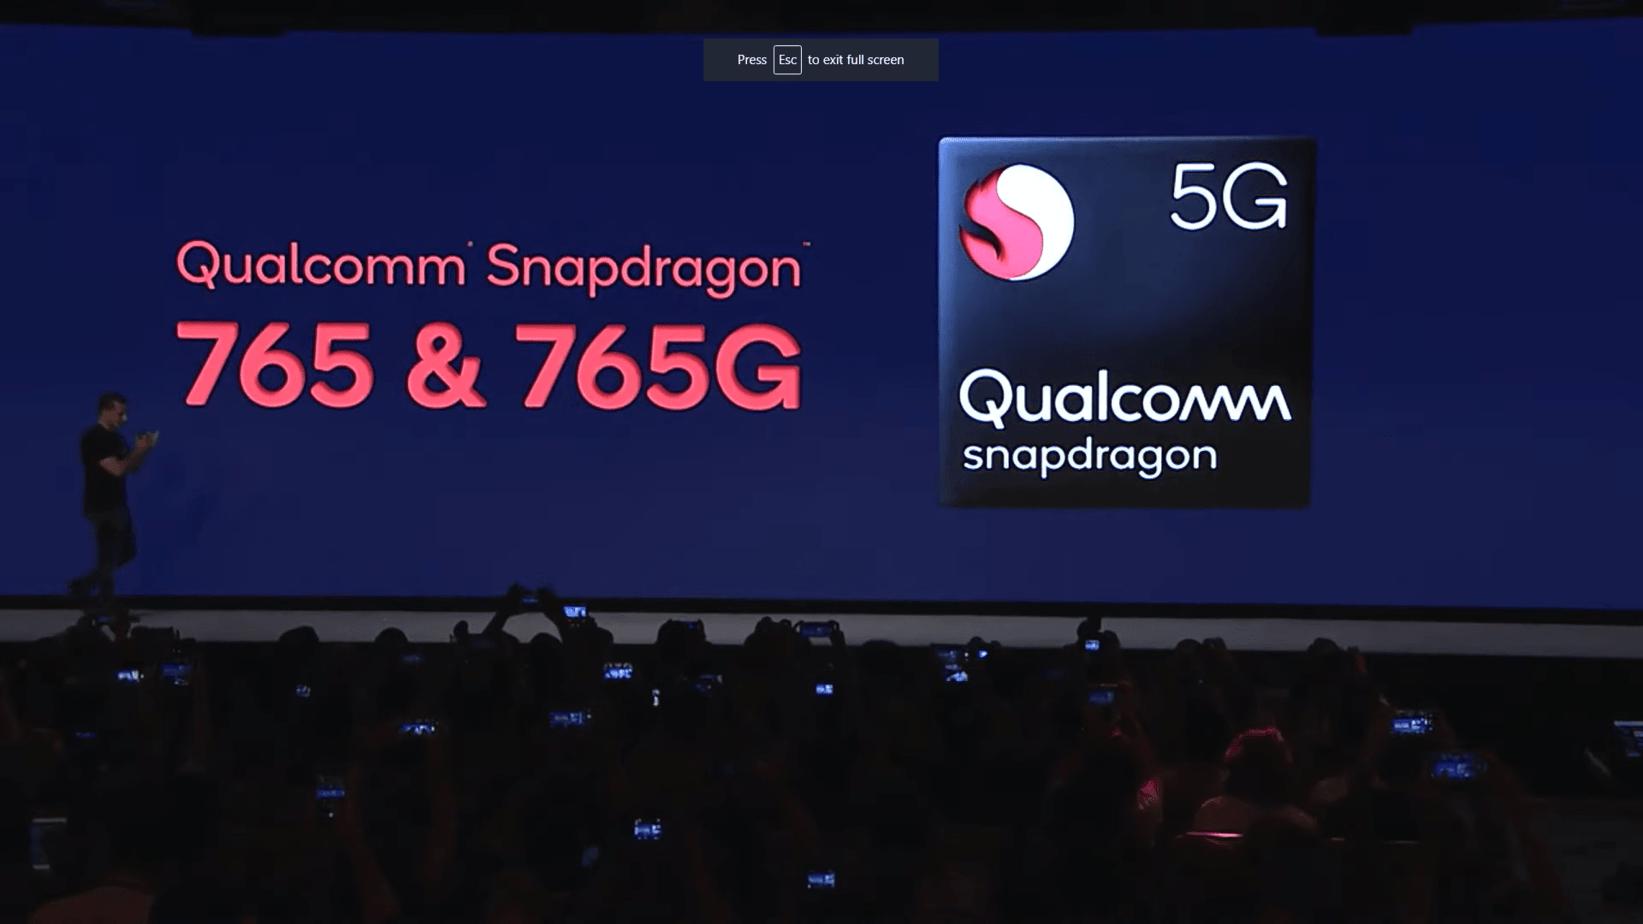 Google Pixel 5 Qualcomm Snapdragon 765 & 765G